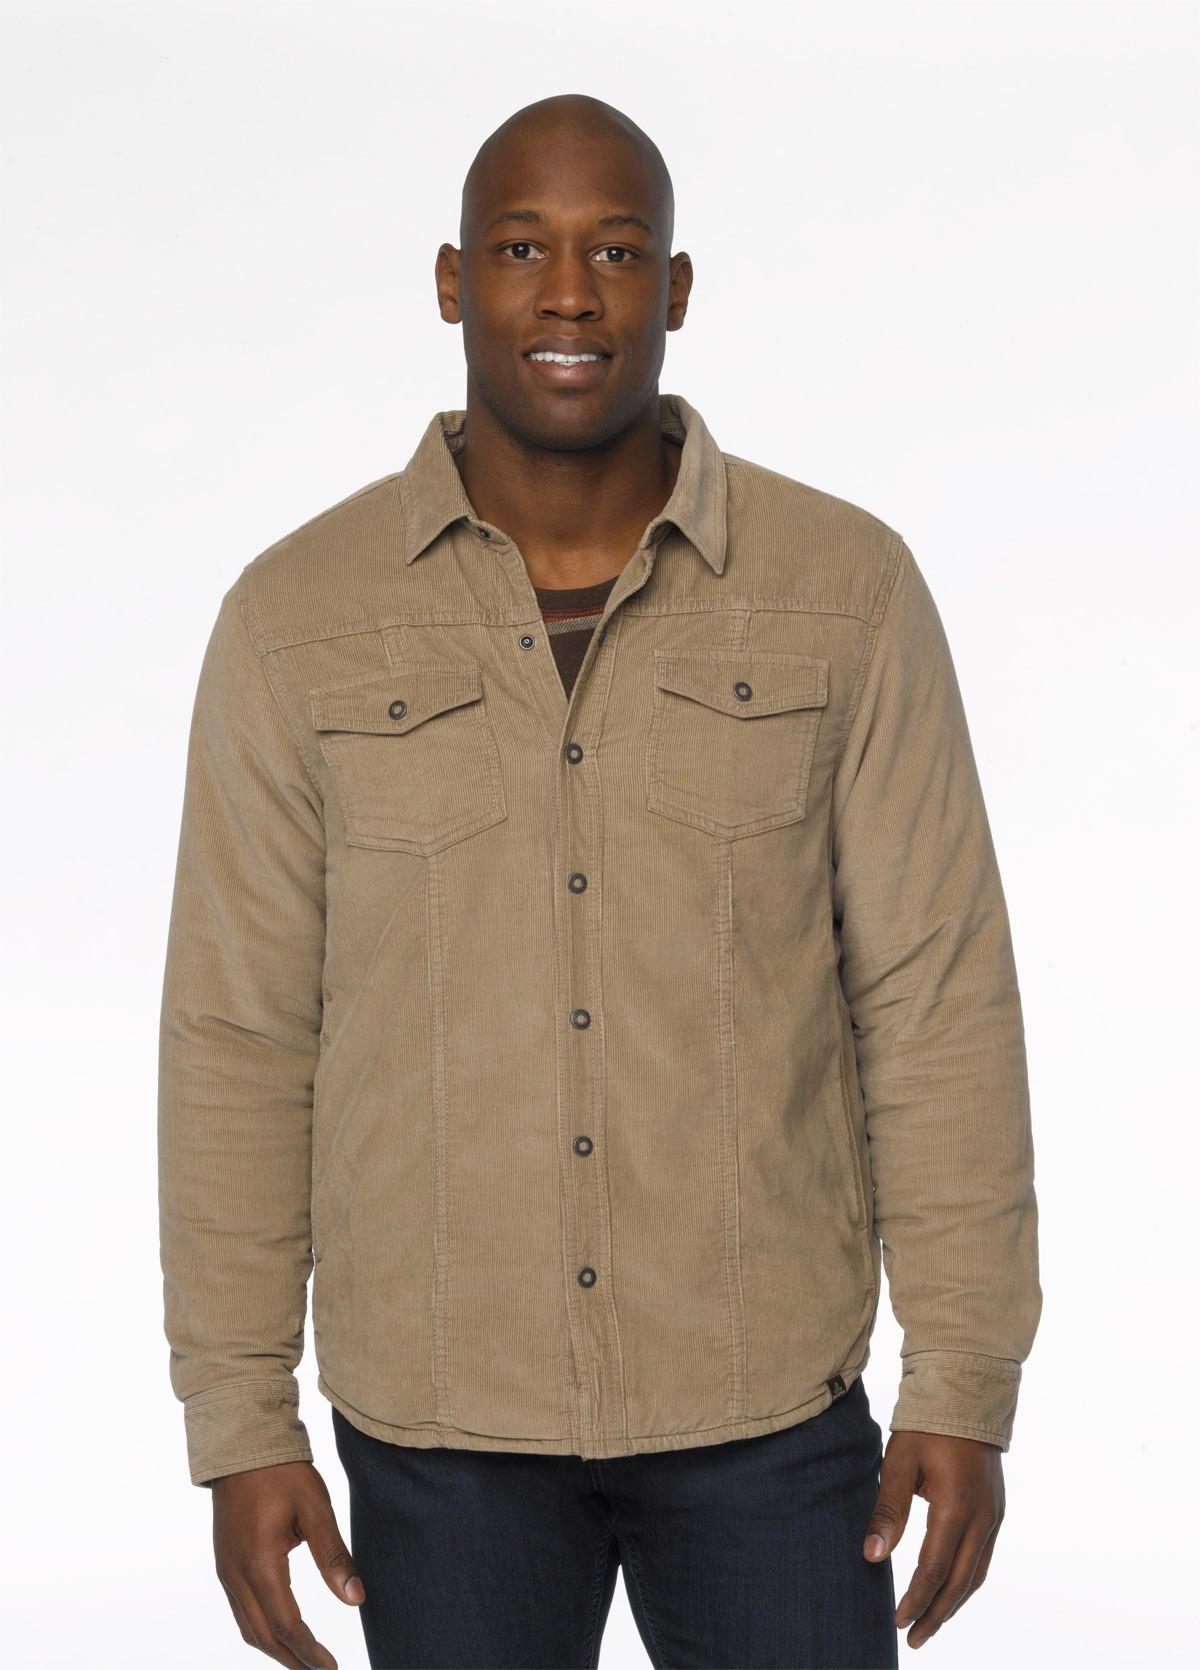 corduroy jacket choose a color: dark khaki MBQEJNR